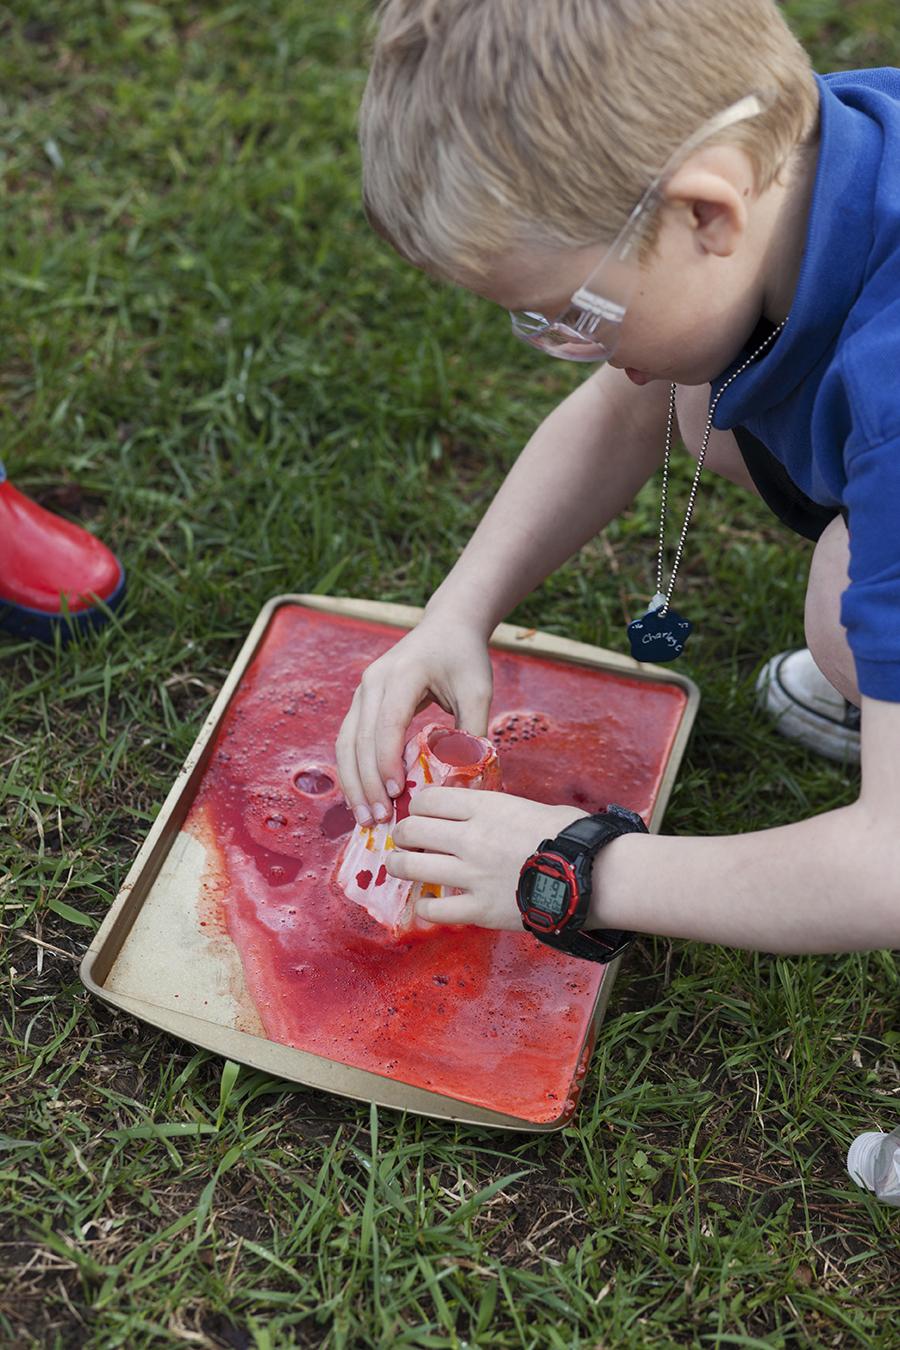 Jax Creations Photography, coeur d'alene child photographer, child photography